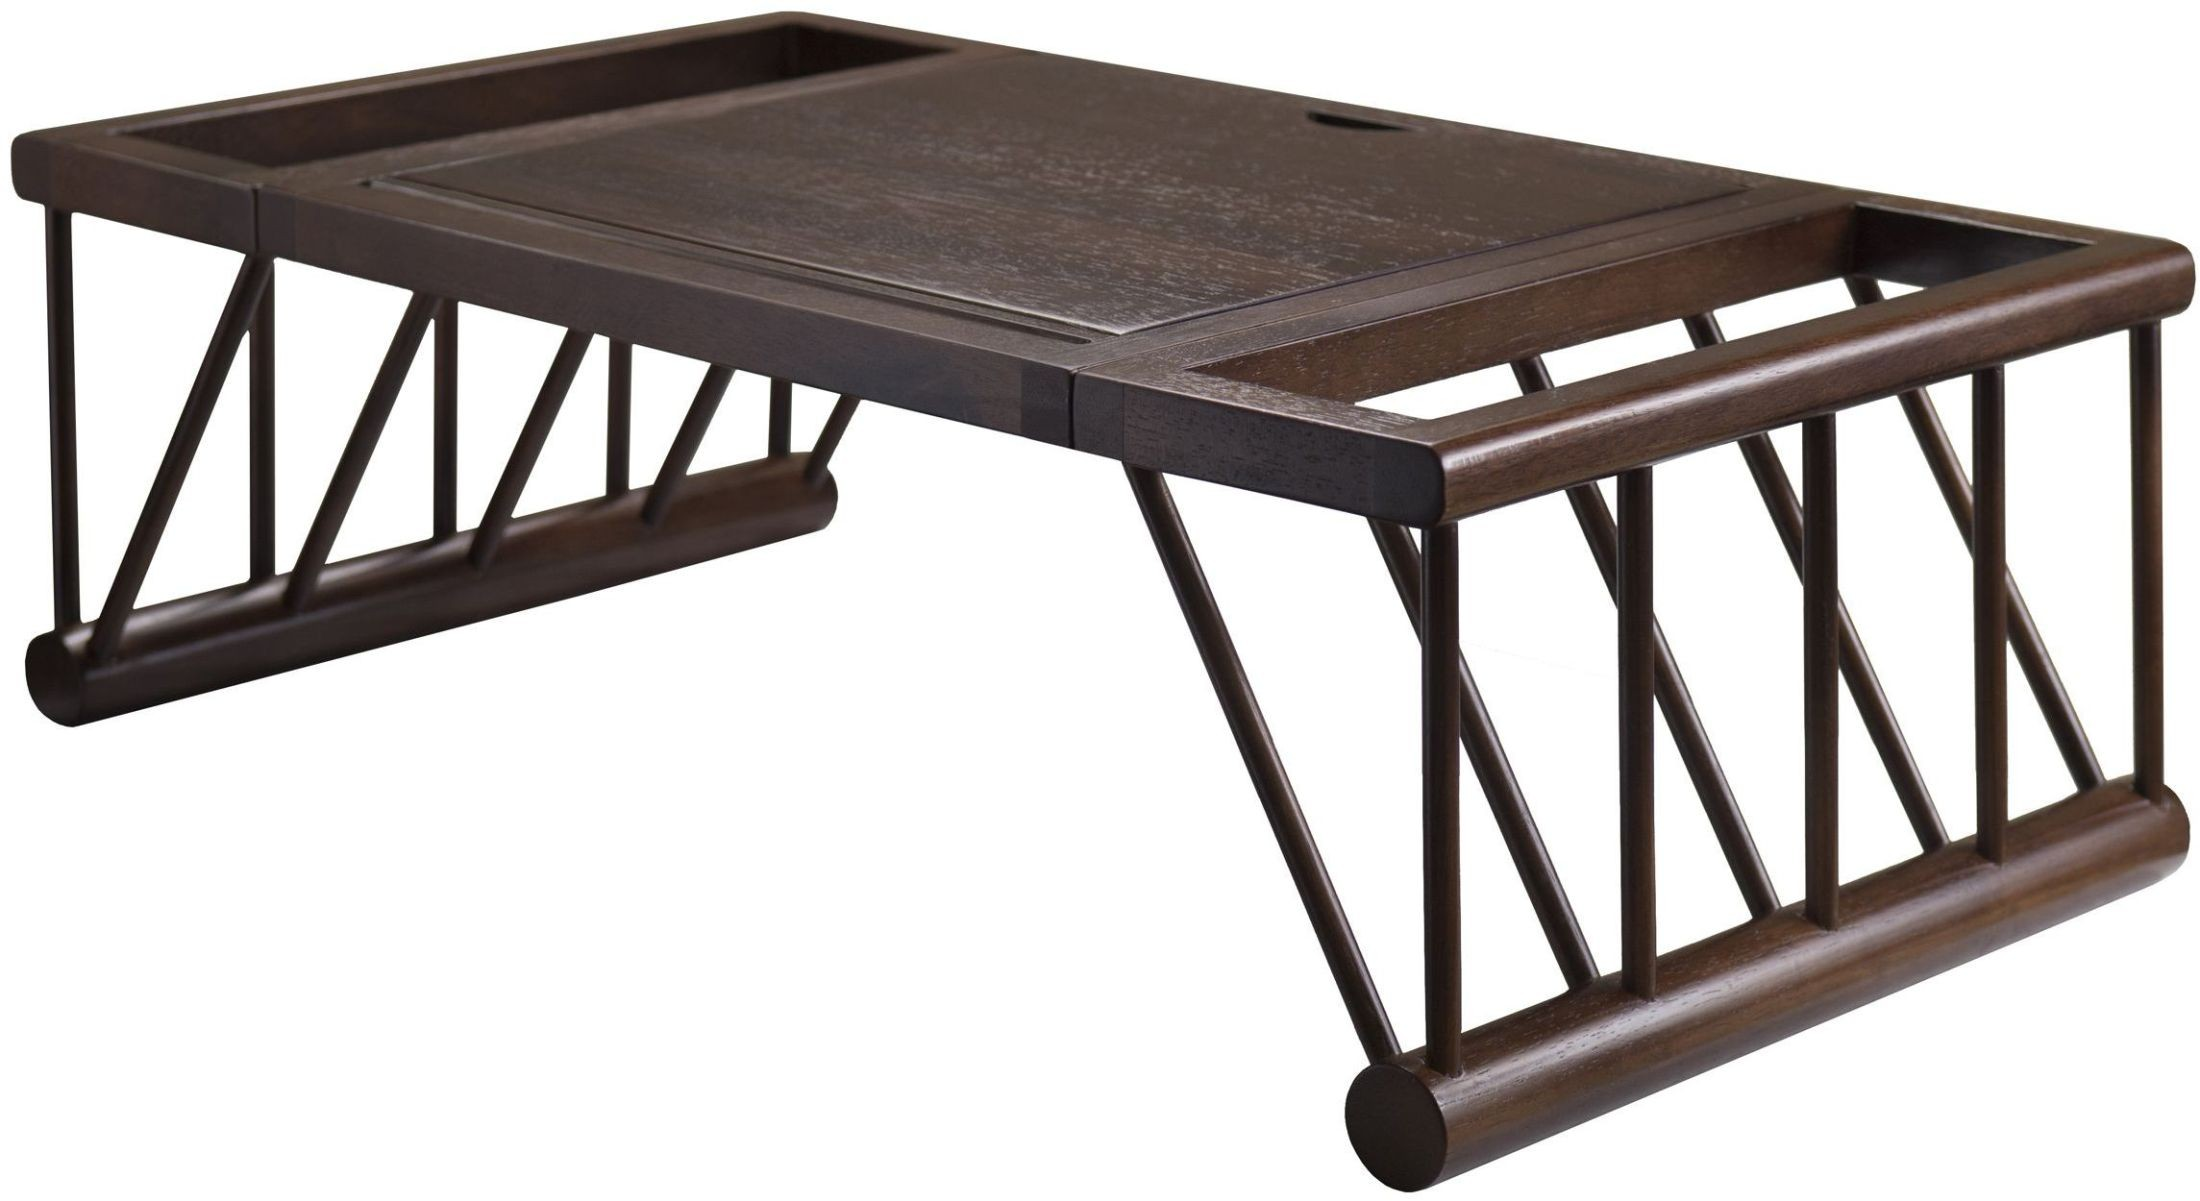 Cambridge Cappuccino Tilt Top Lap Bed Desk 40117 Winsome